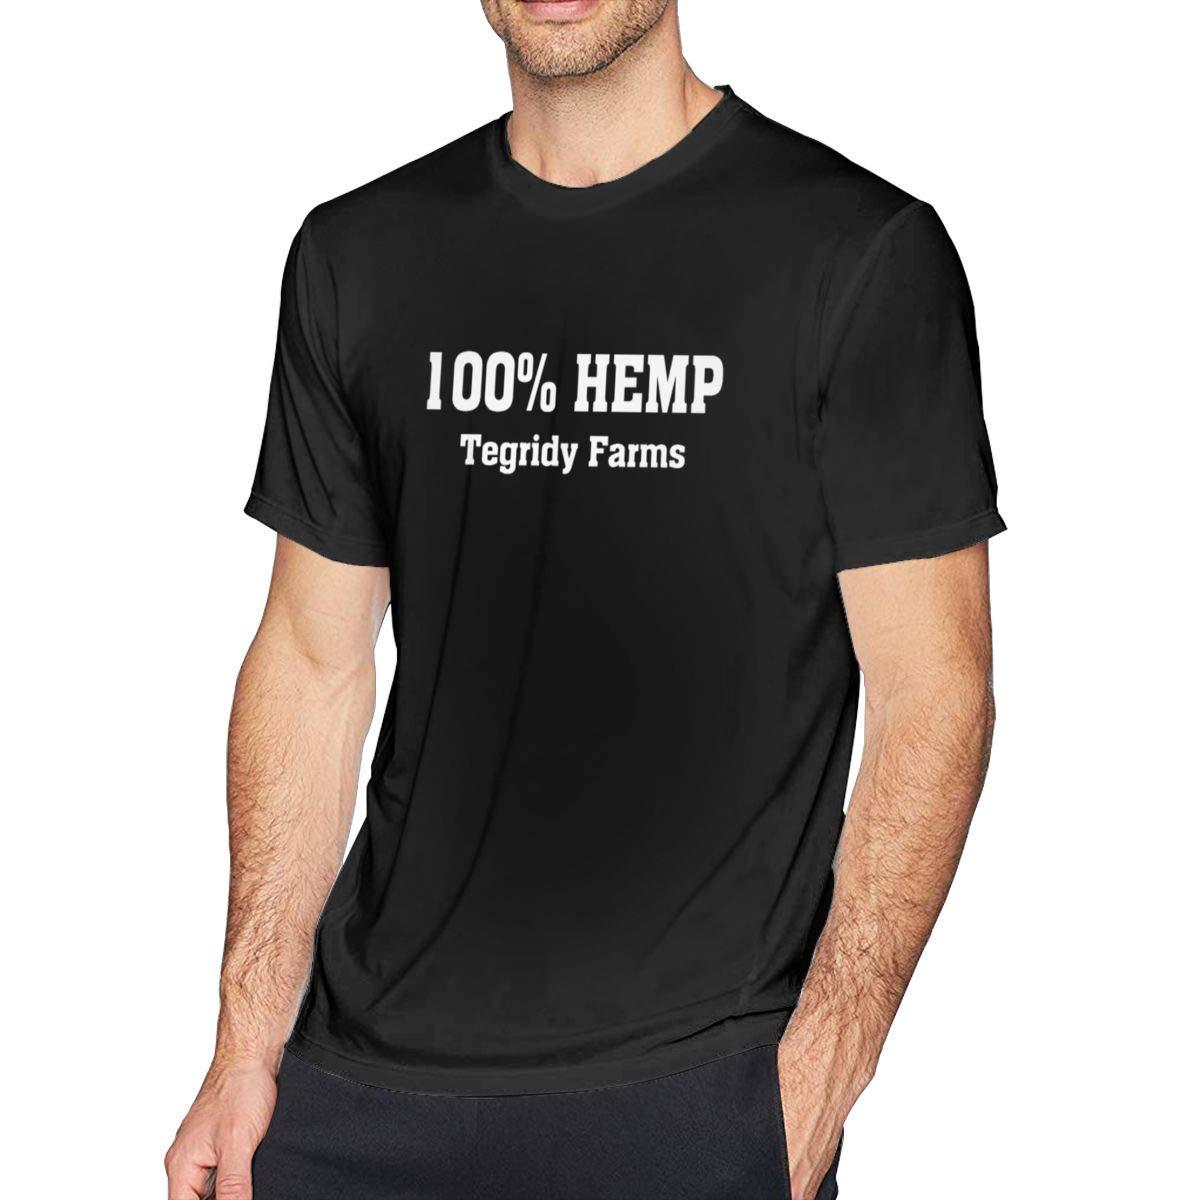 100 Hemp Tegridy Farms Crew Neck Tshirt Short Sleeve Tops For S